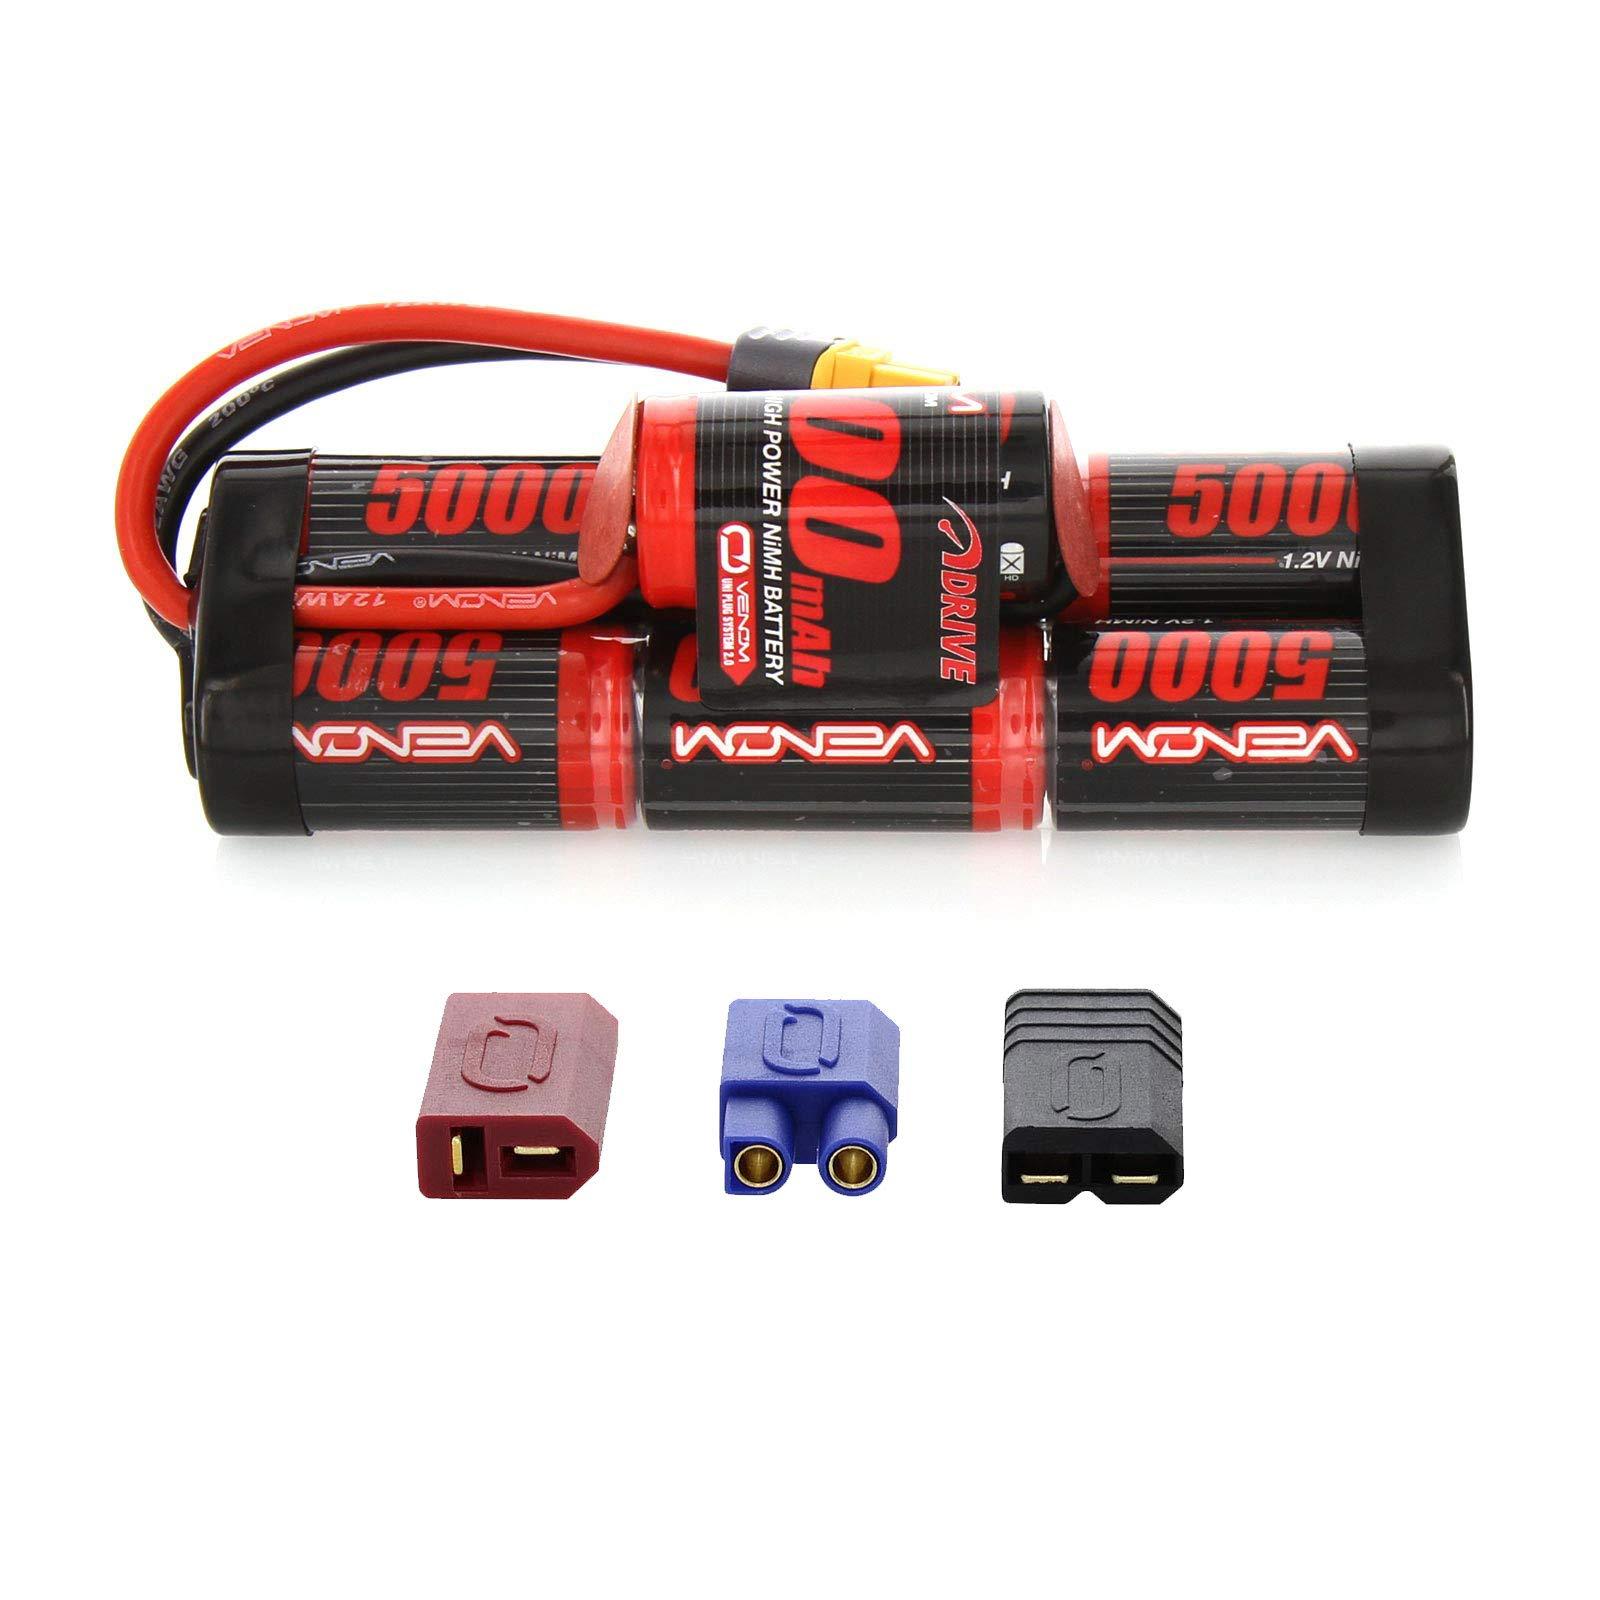 Venom 8.4V 5000mAh 7-Cell Hump Pack NiMH Battery with Universal Plug (EC3/Deans/Traxxas/Tamiya)